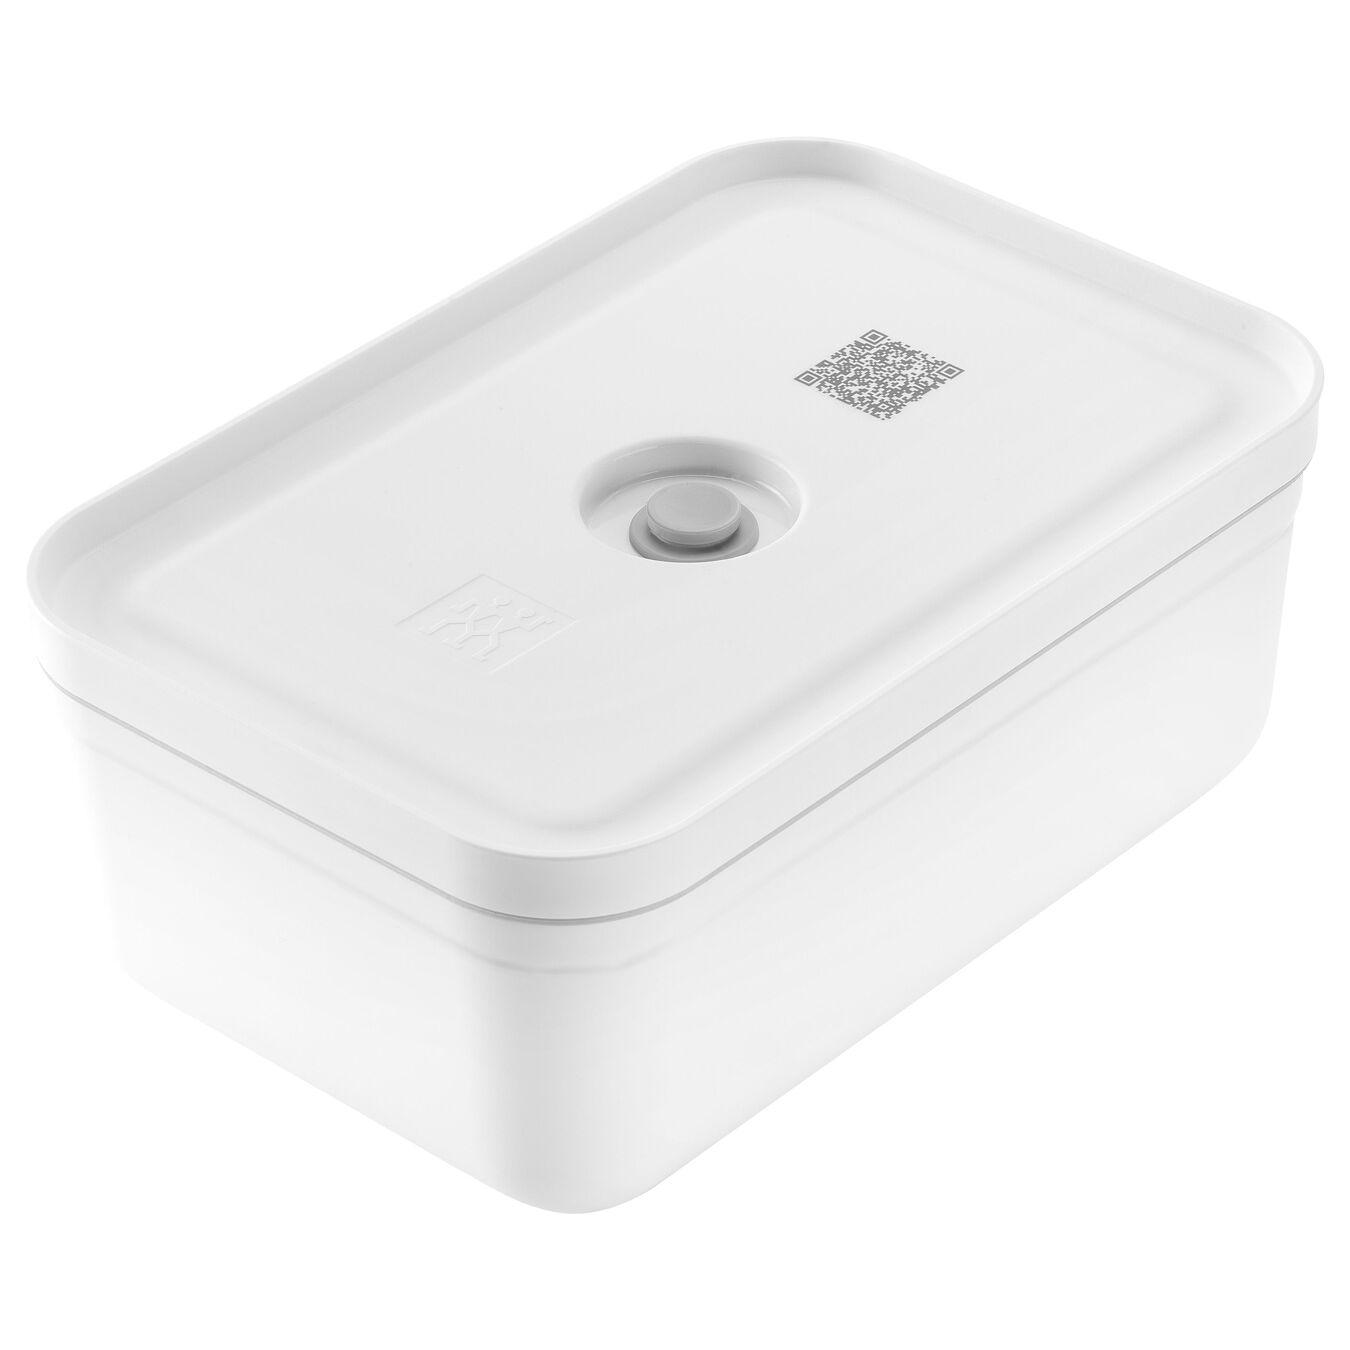 Vakuum Lunchbox, L, Kunststoff, Weiß,,large 1